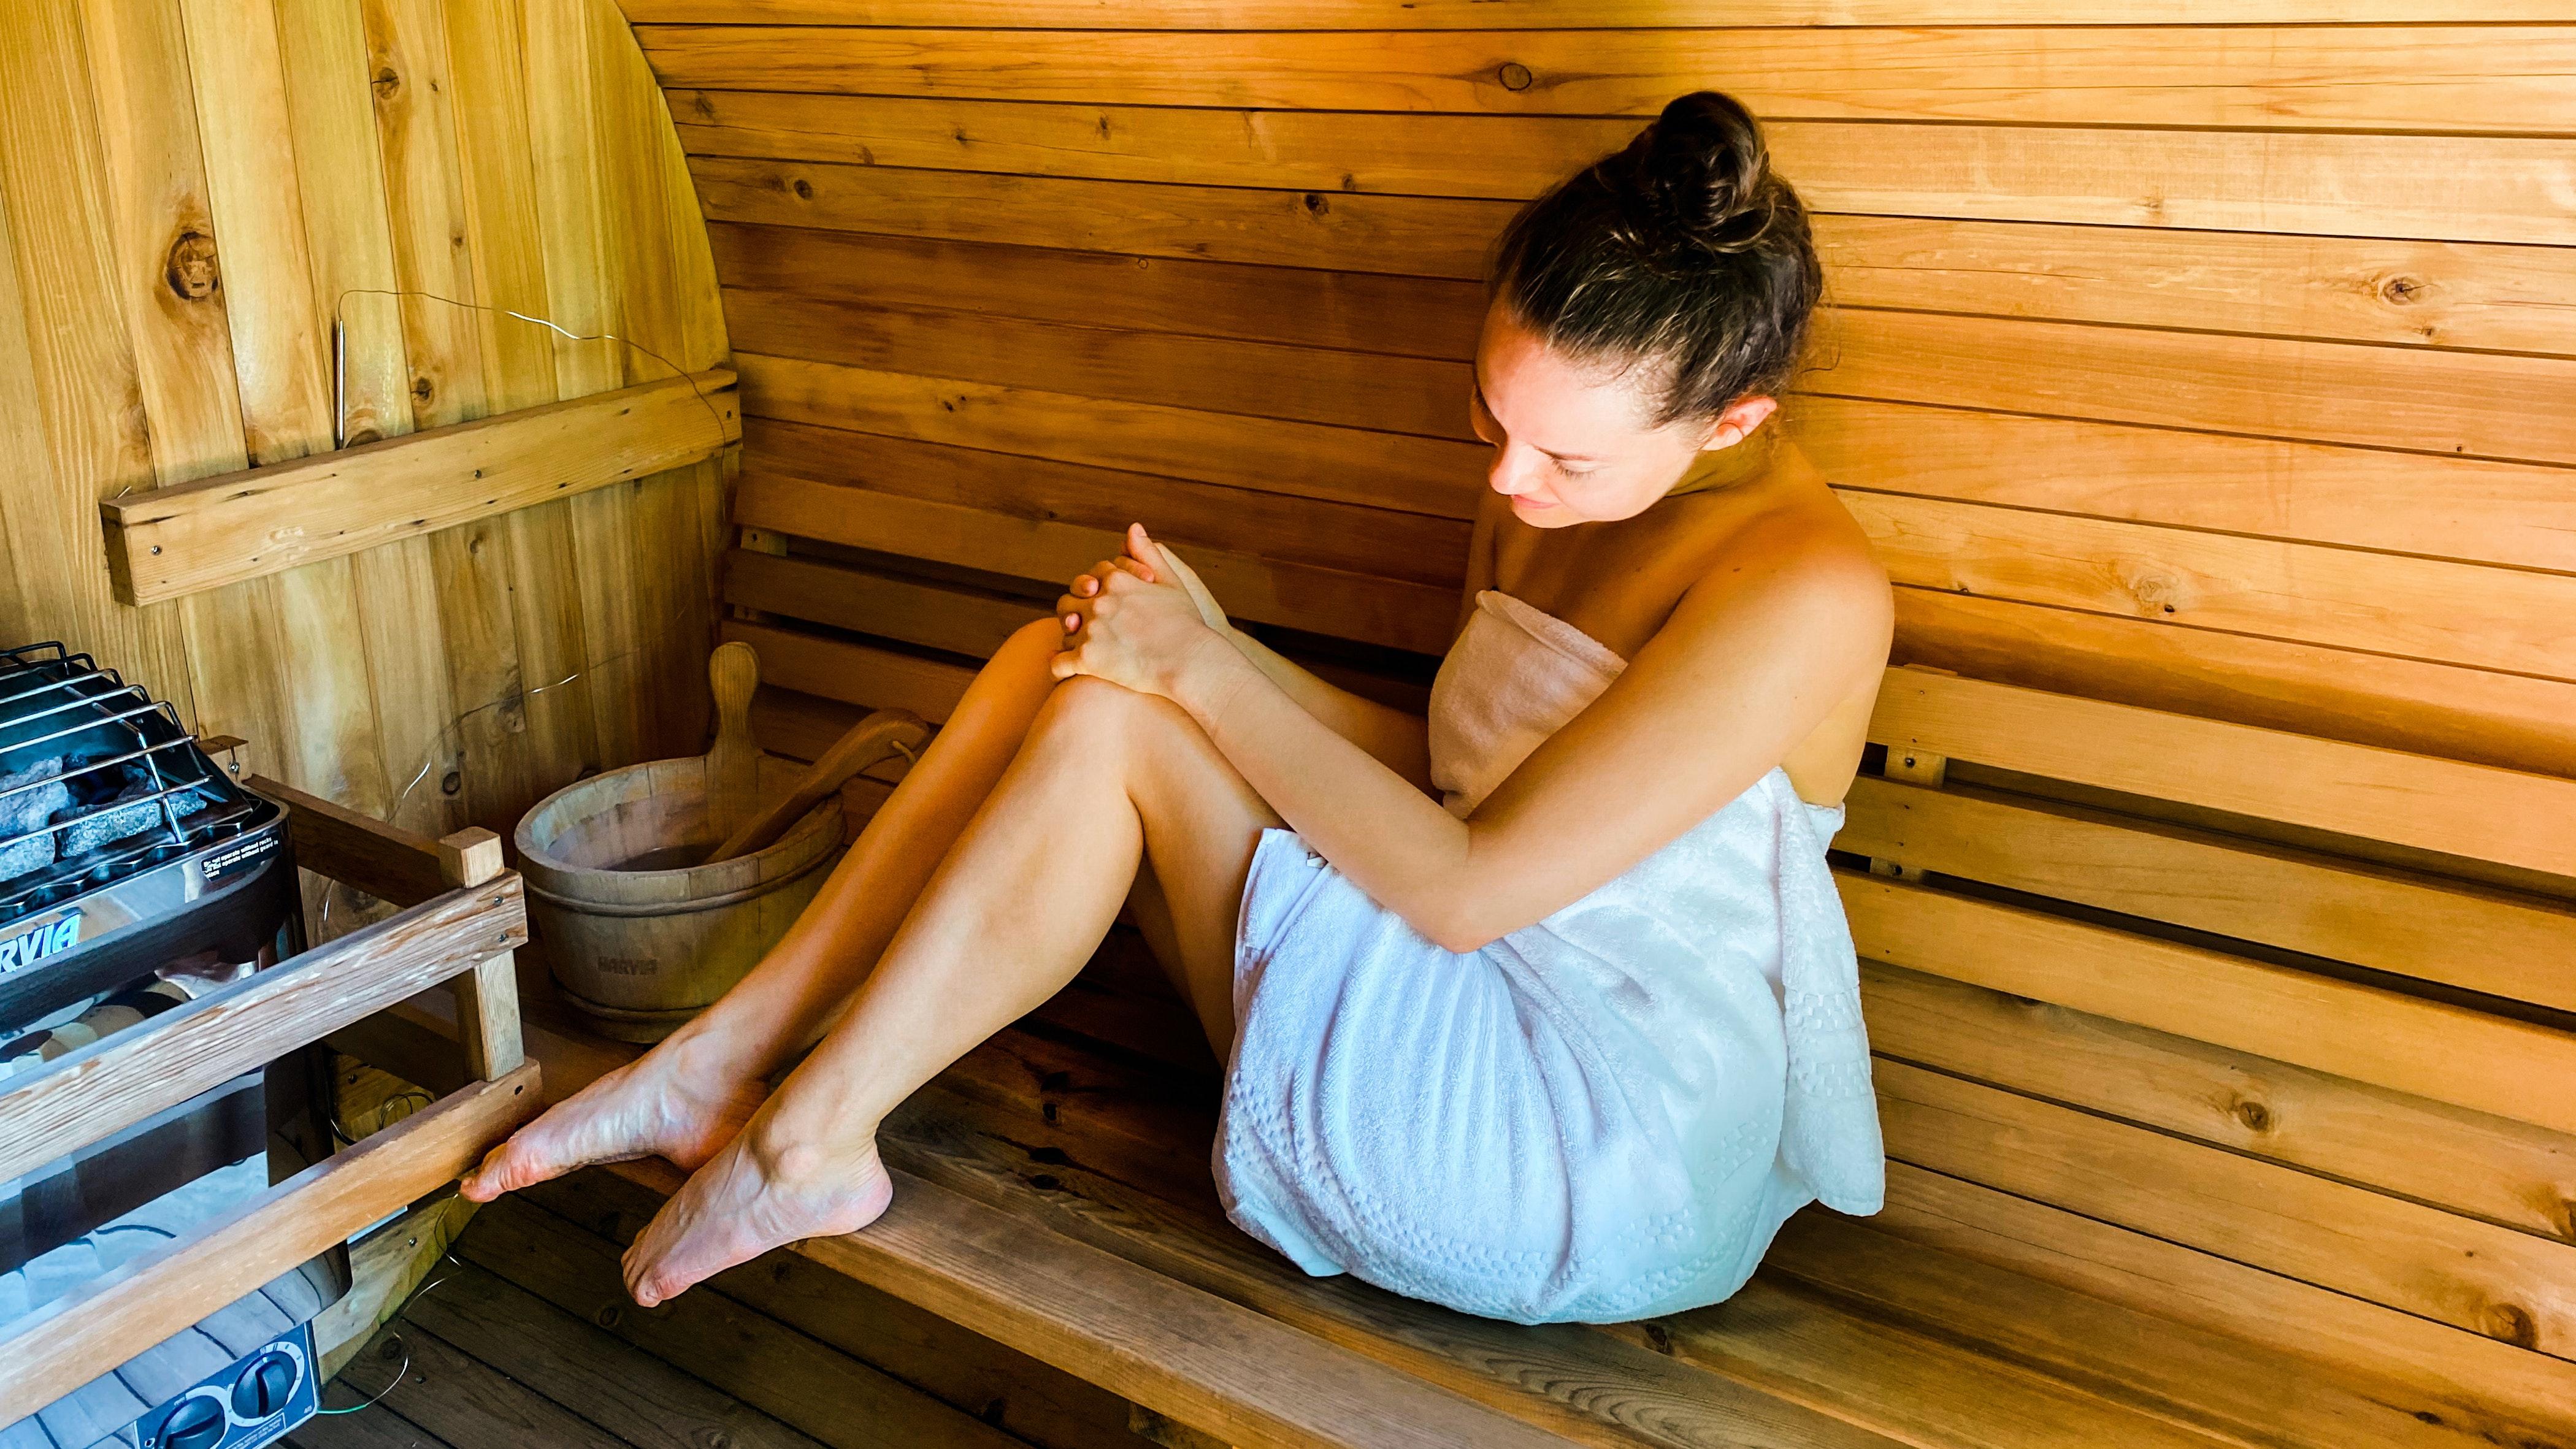 looking at skin inside the barrel sauna